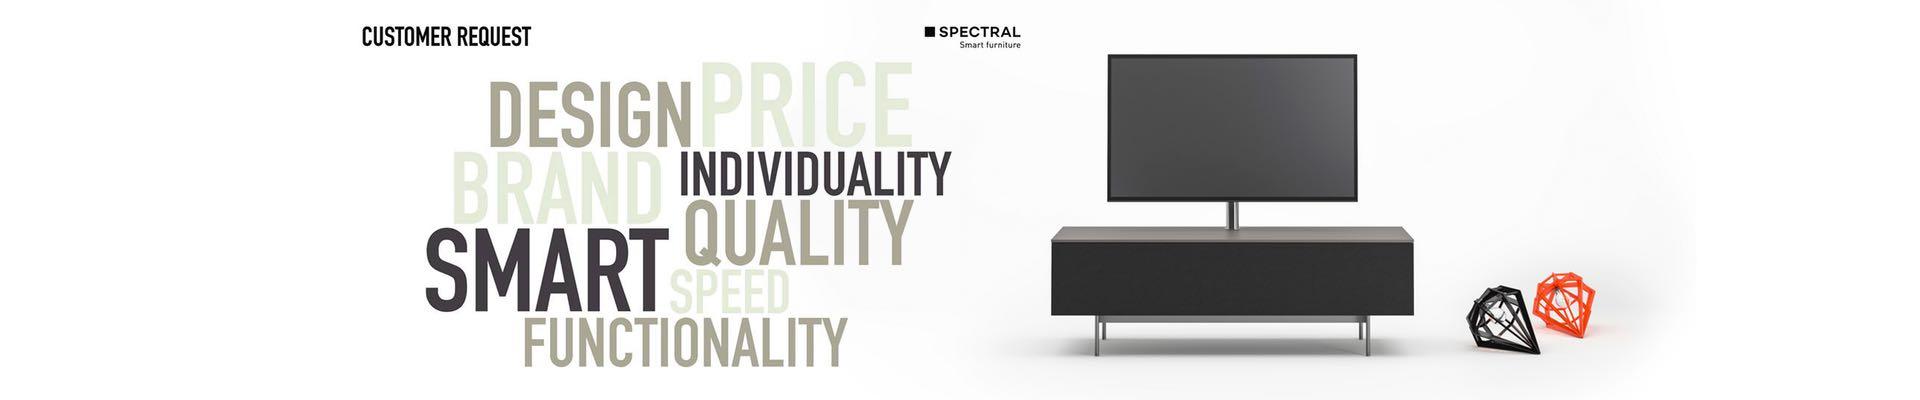 sl-2017-spectral